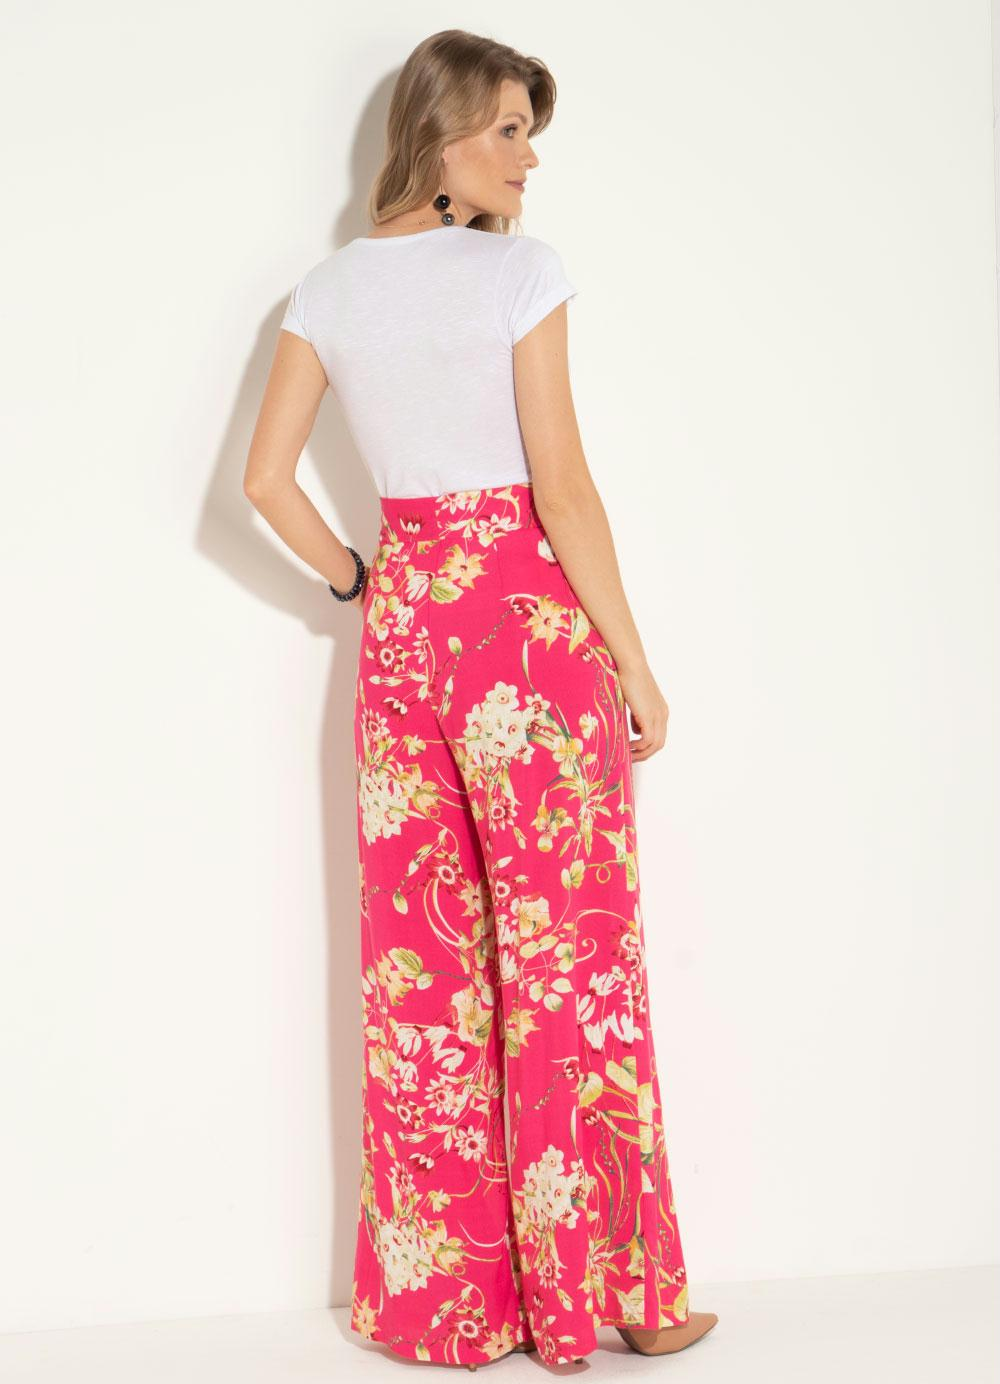 cb7f2ddea Calça Pantalona Floral Ampla com Bolsos - Quintess